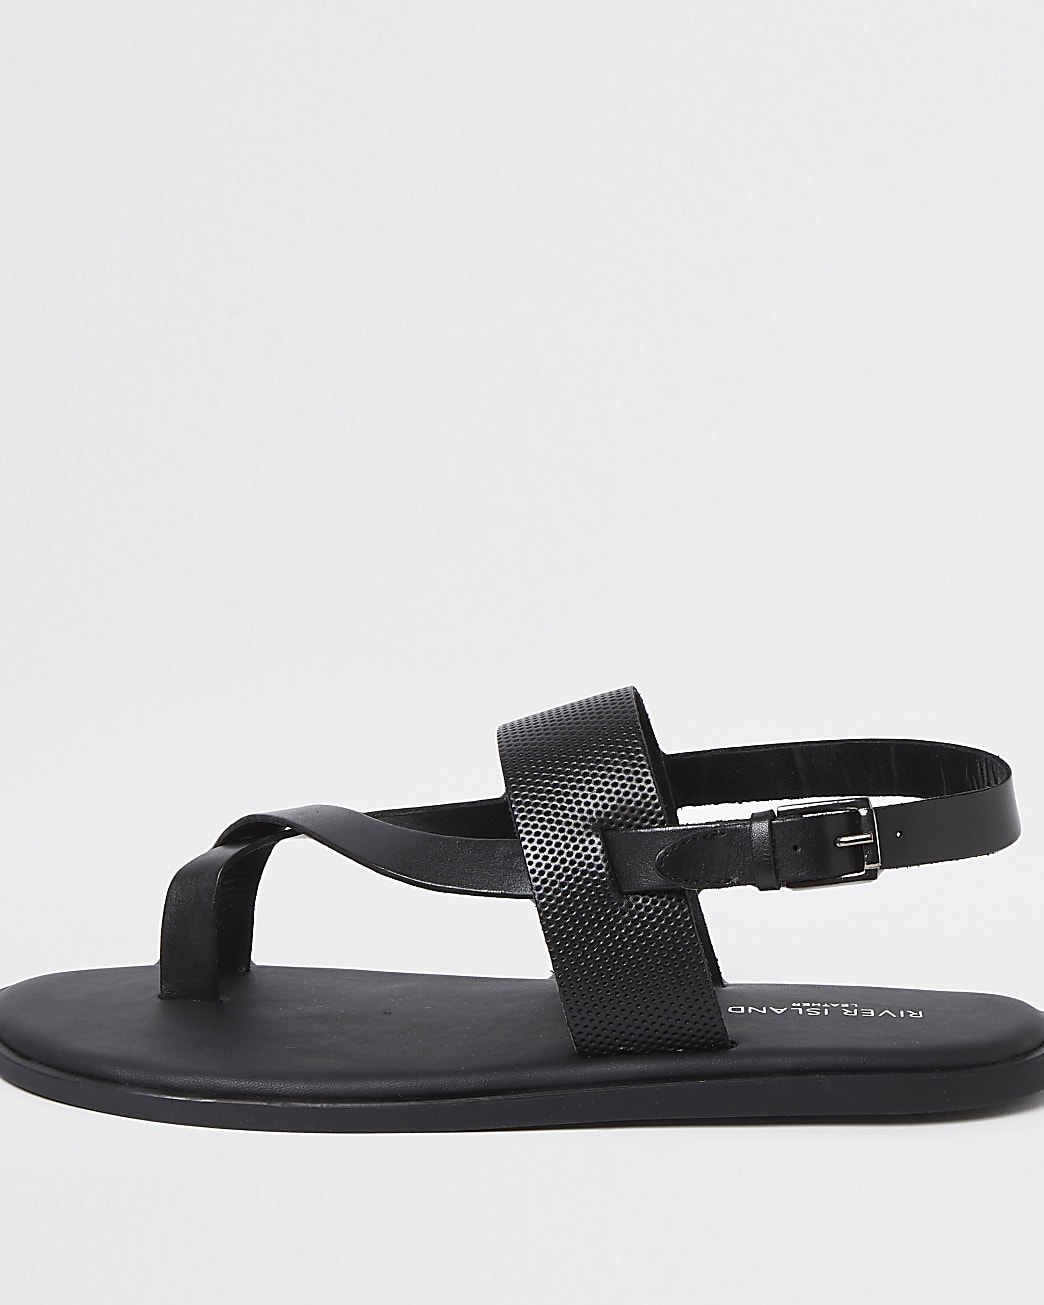 Black leather strap sandal